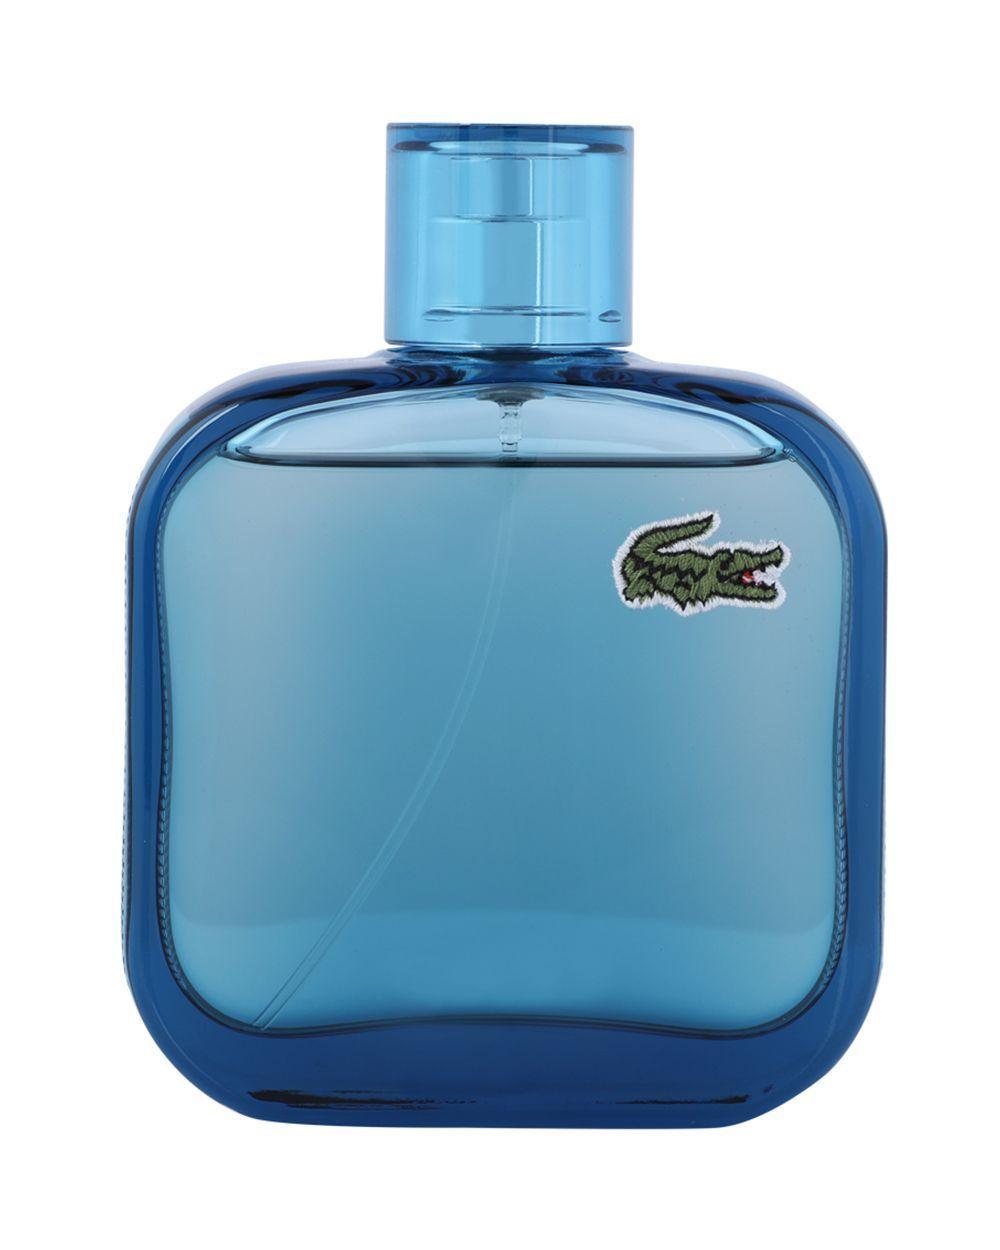 Lacoste L.12.12 Blue Men Perfume EDT 100 ml | Buy Men's ...